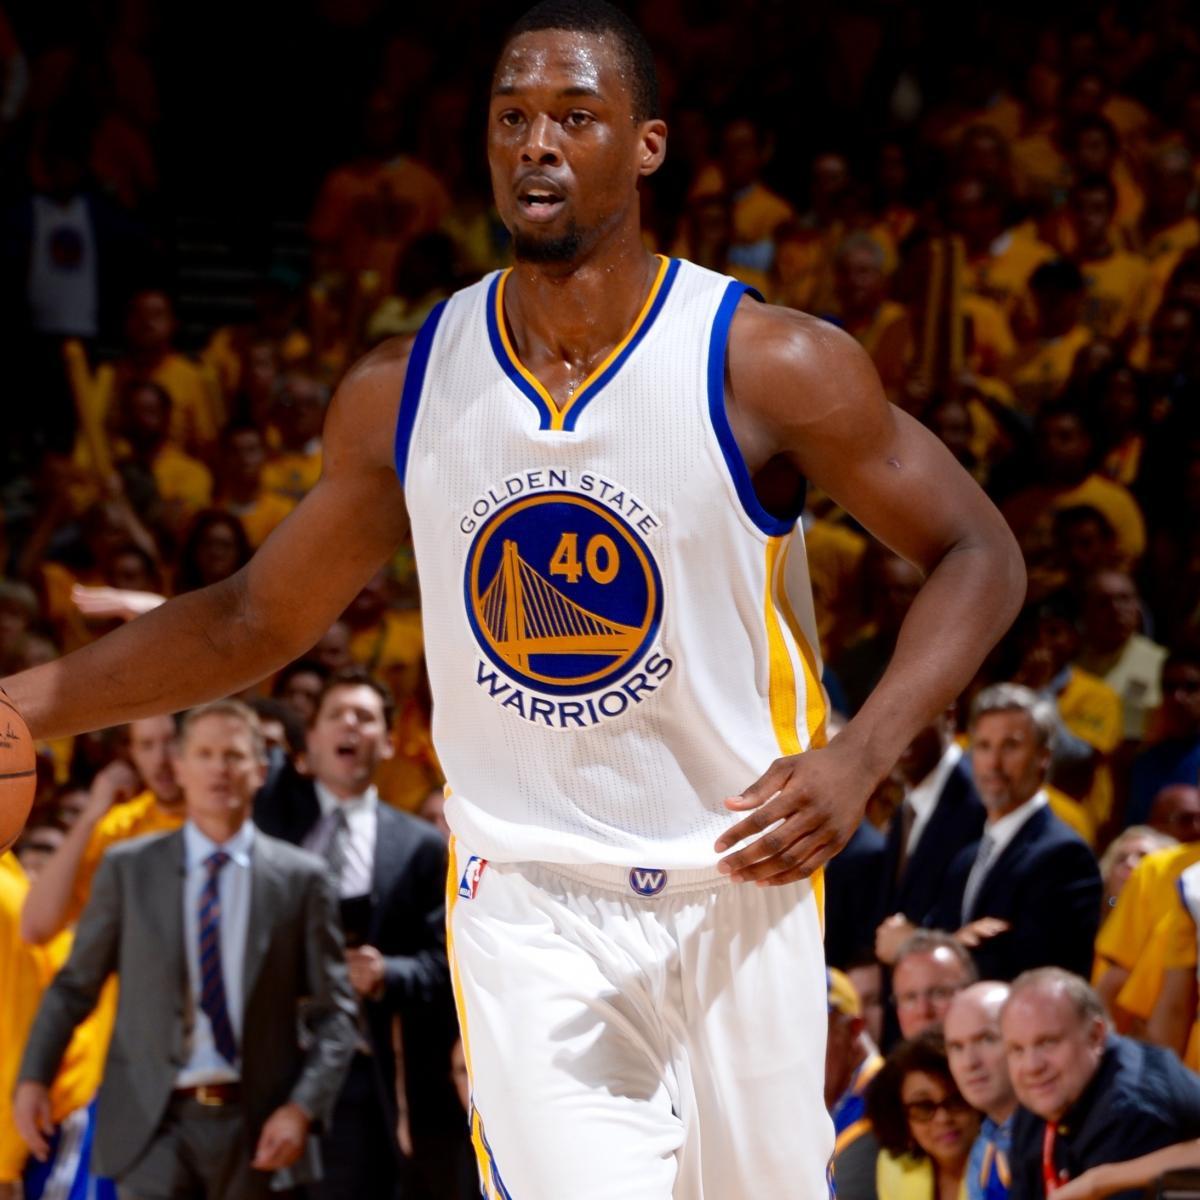 Harrison Barnes Nba: Harrison Barnes Among NBA's Most Intriguing Early Contract